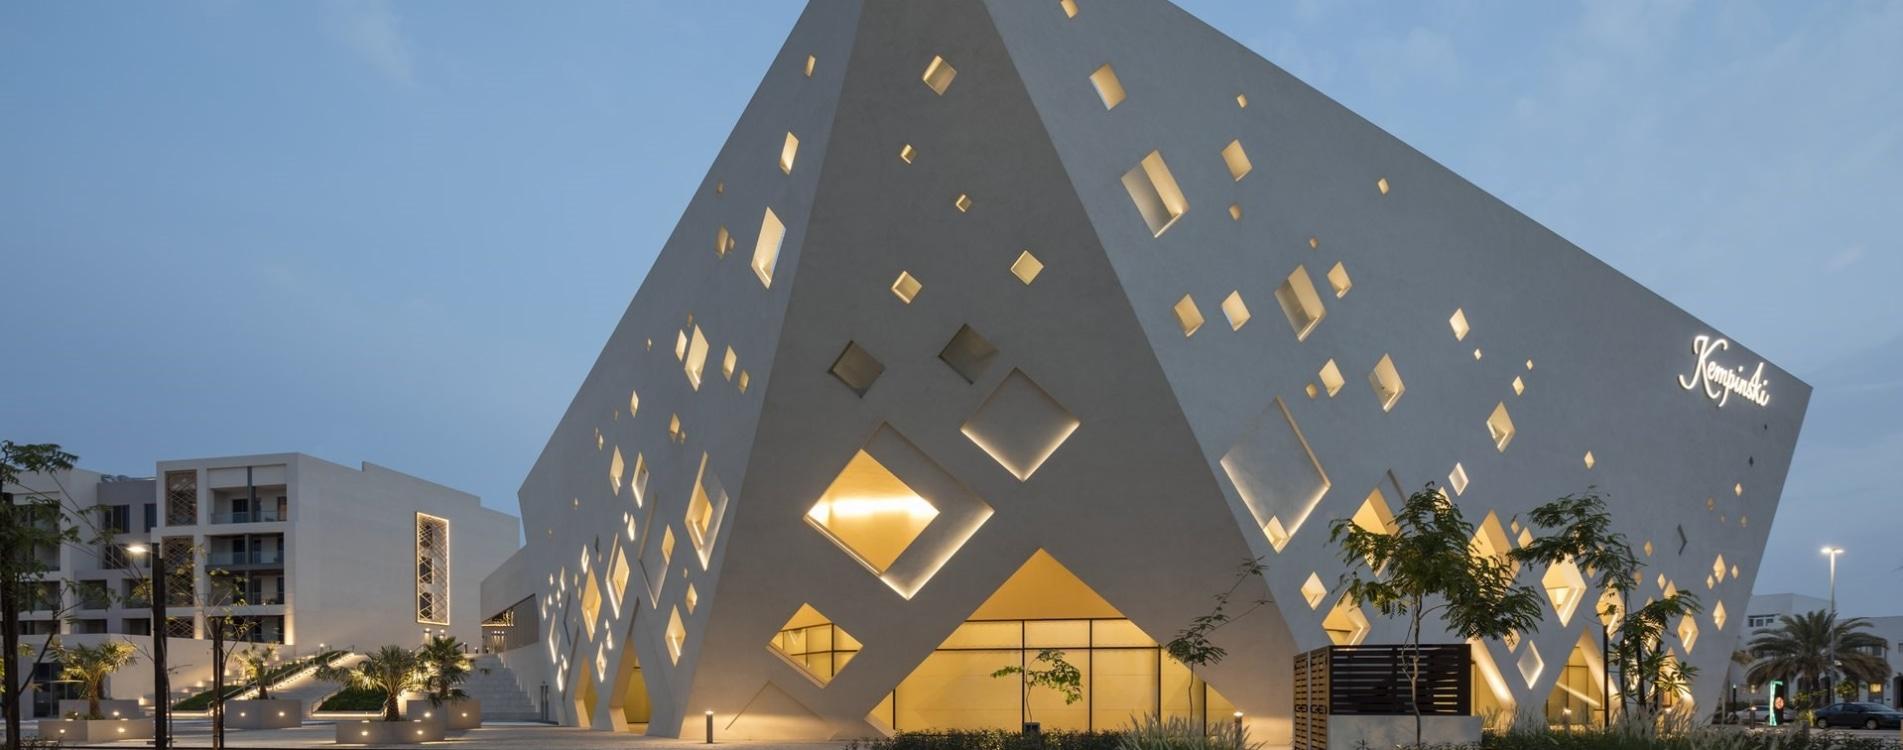 Kempinski-Hotel-Muscat-Festsaal-Exterior-Oman